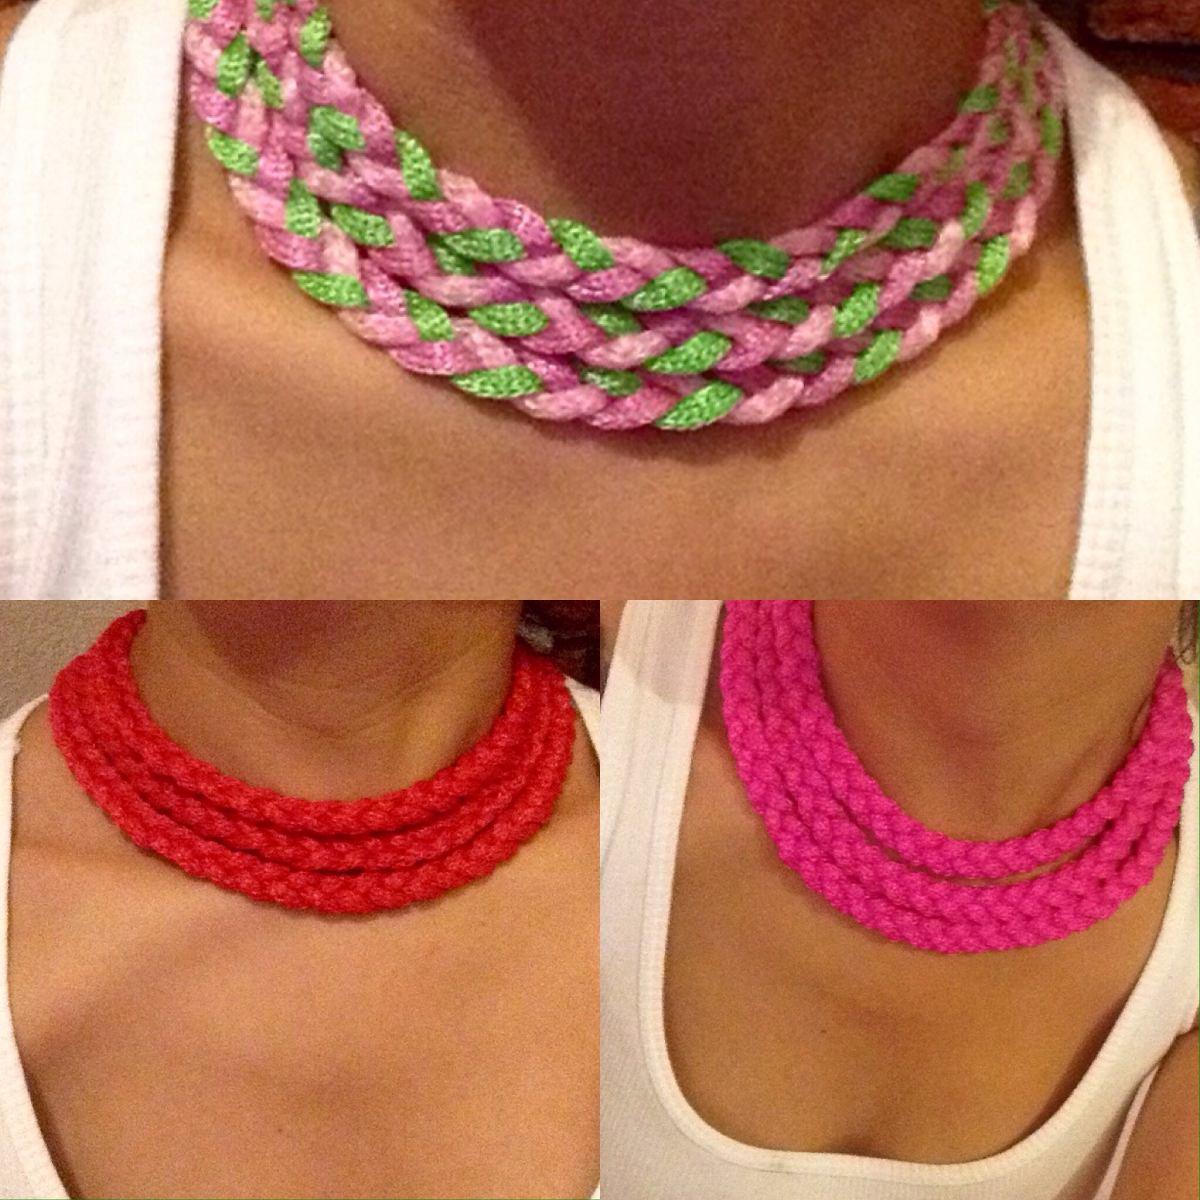 collar, joyería, accesorio, mujer, bisutería, gargantilla